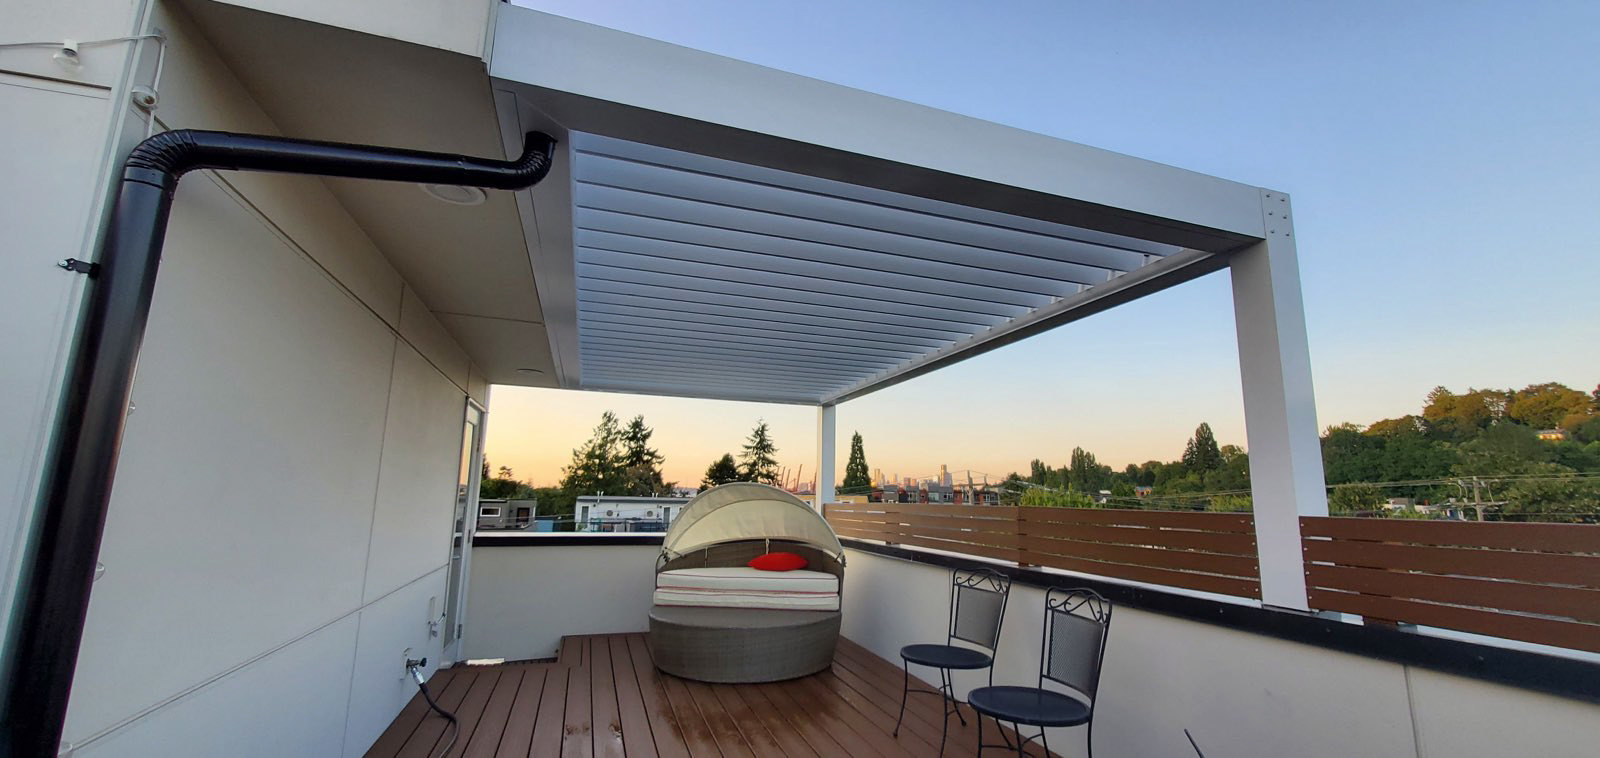 White-Deck-Residential Louvered Pergola Sunroof